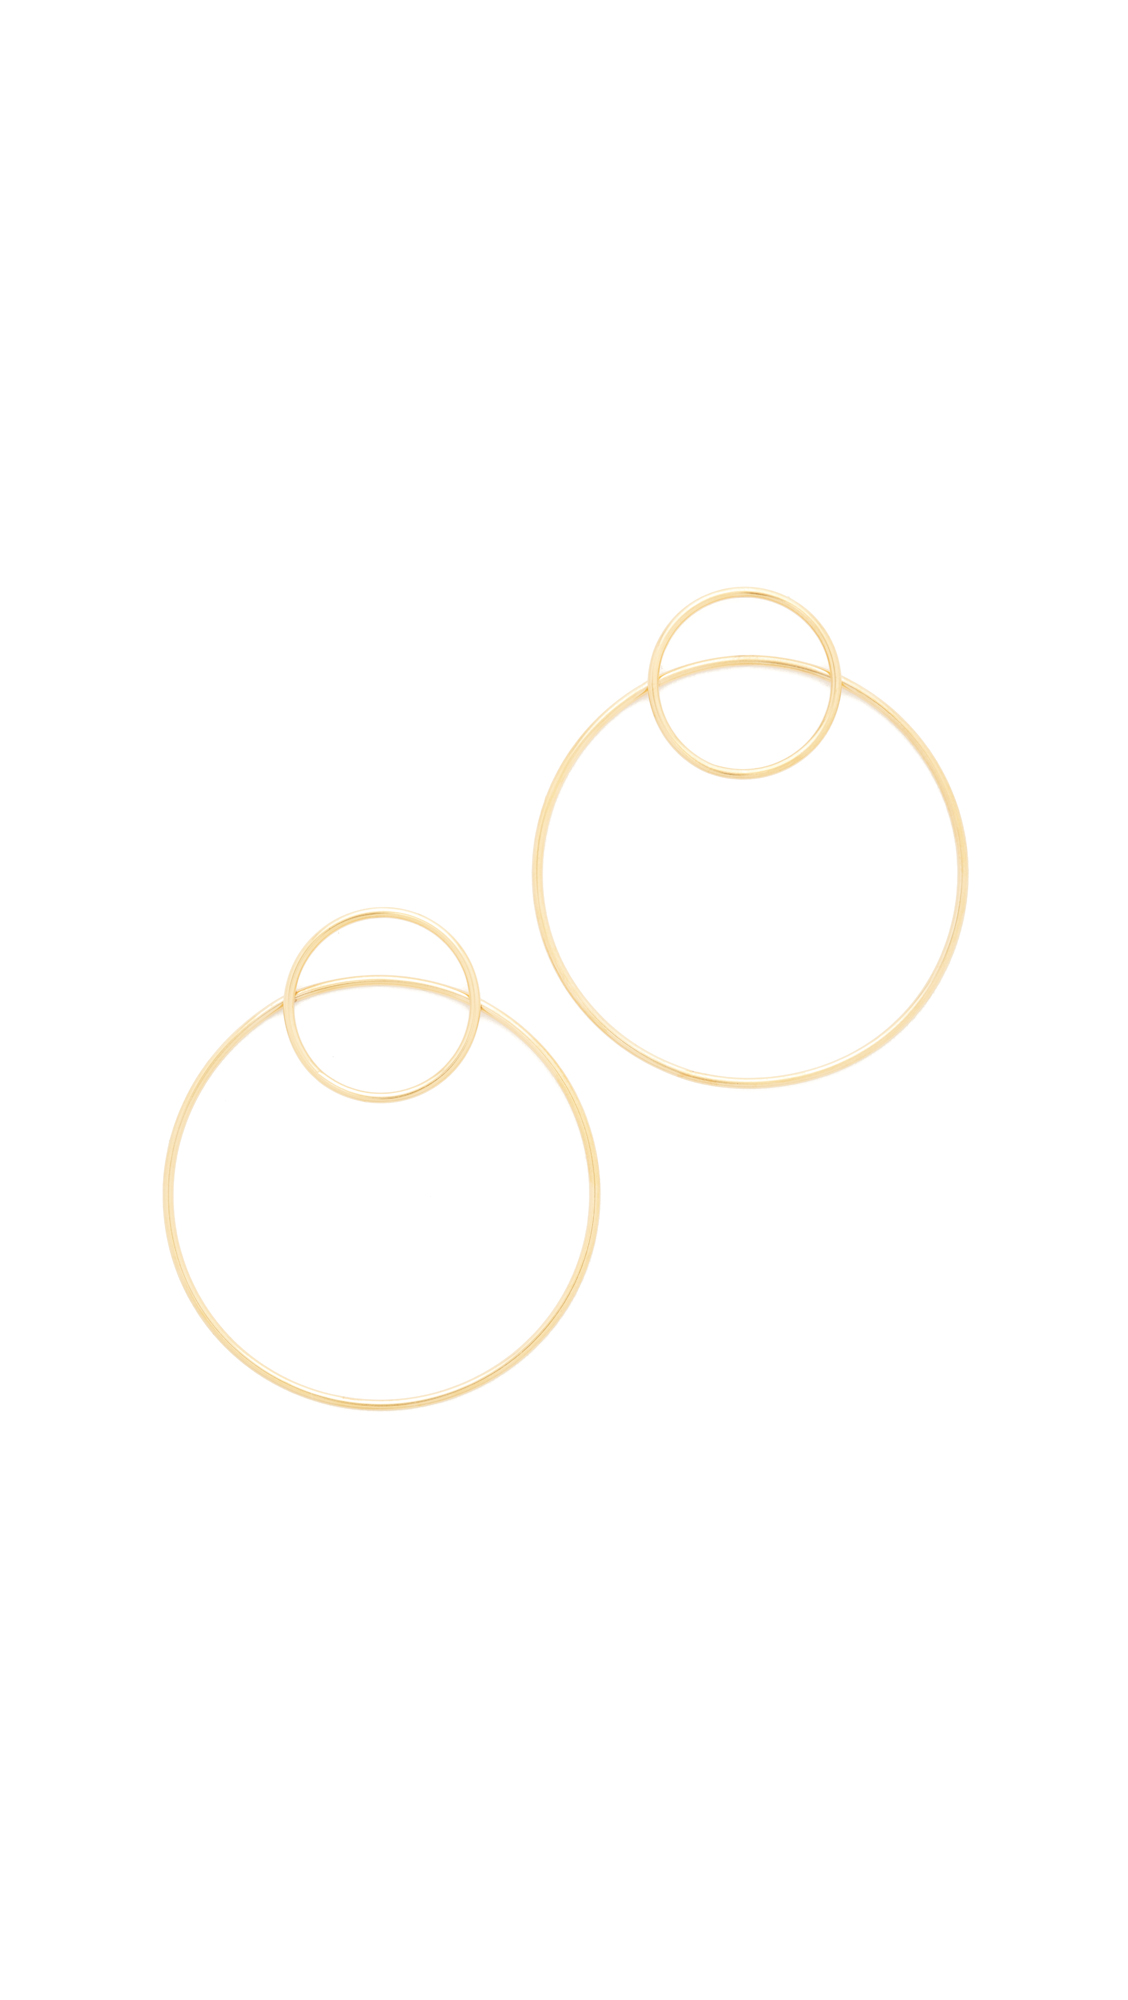 Amber Sceats Gray Earrings - Gold